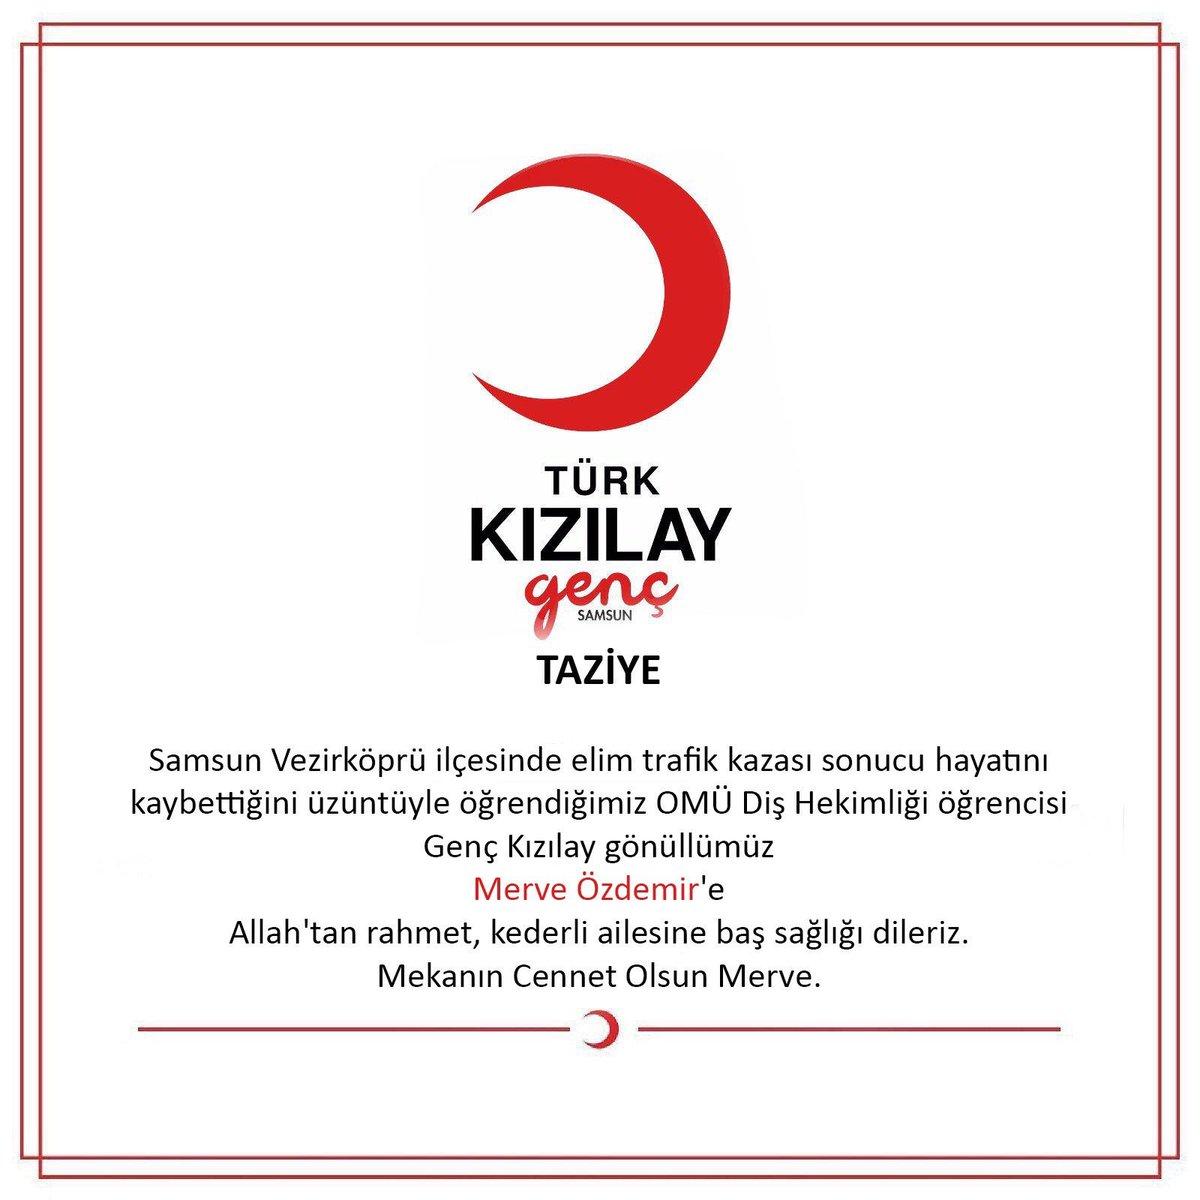 Genç Kızılay (@genckizilay)